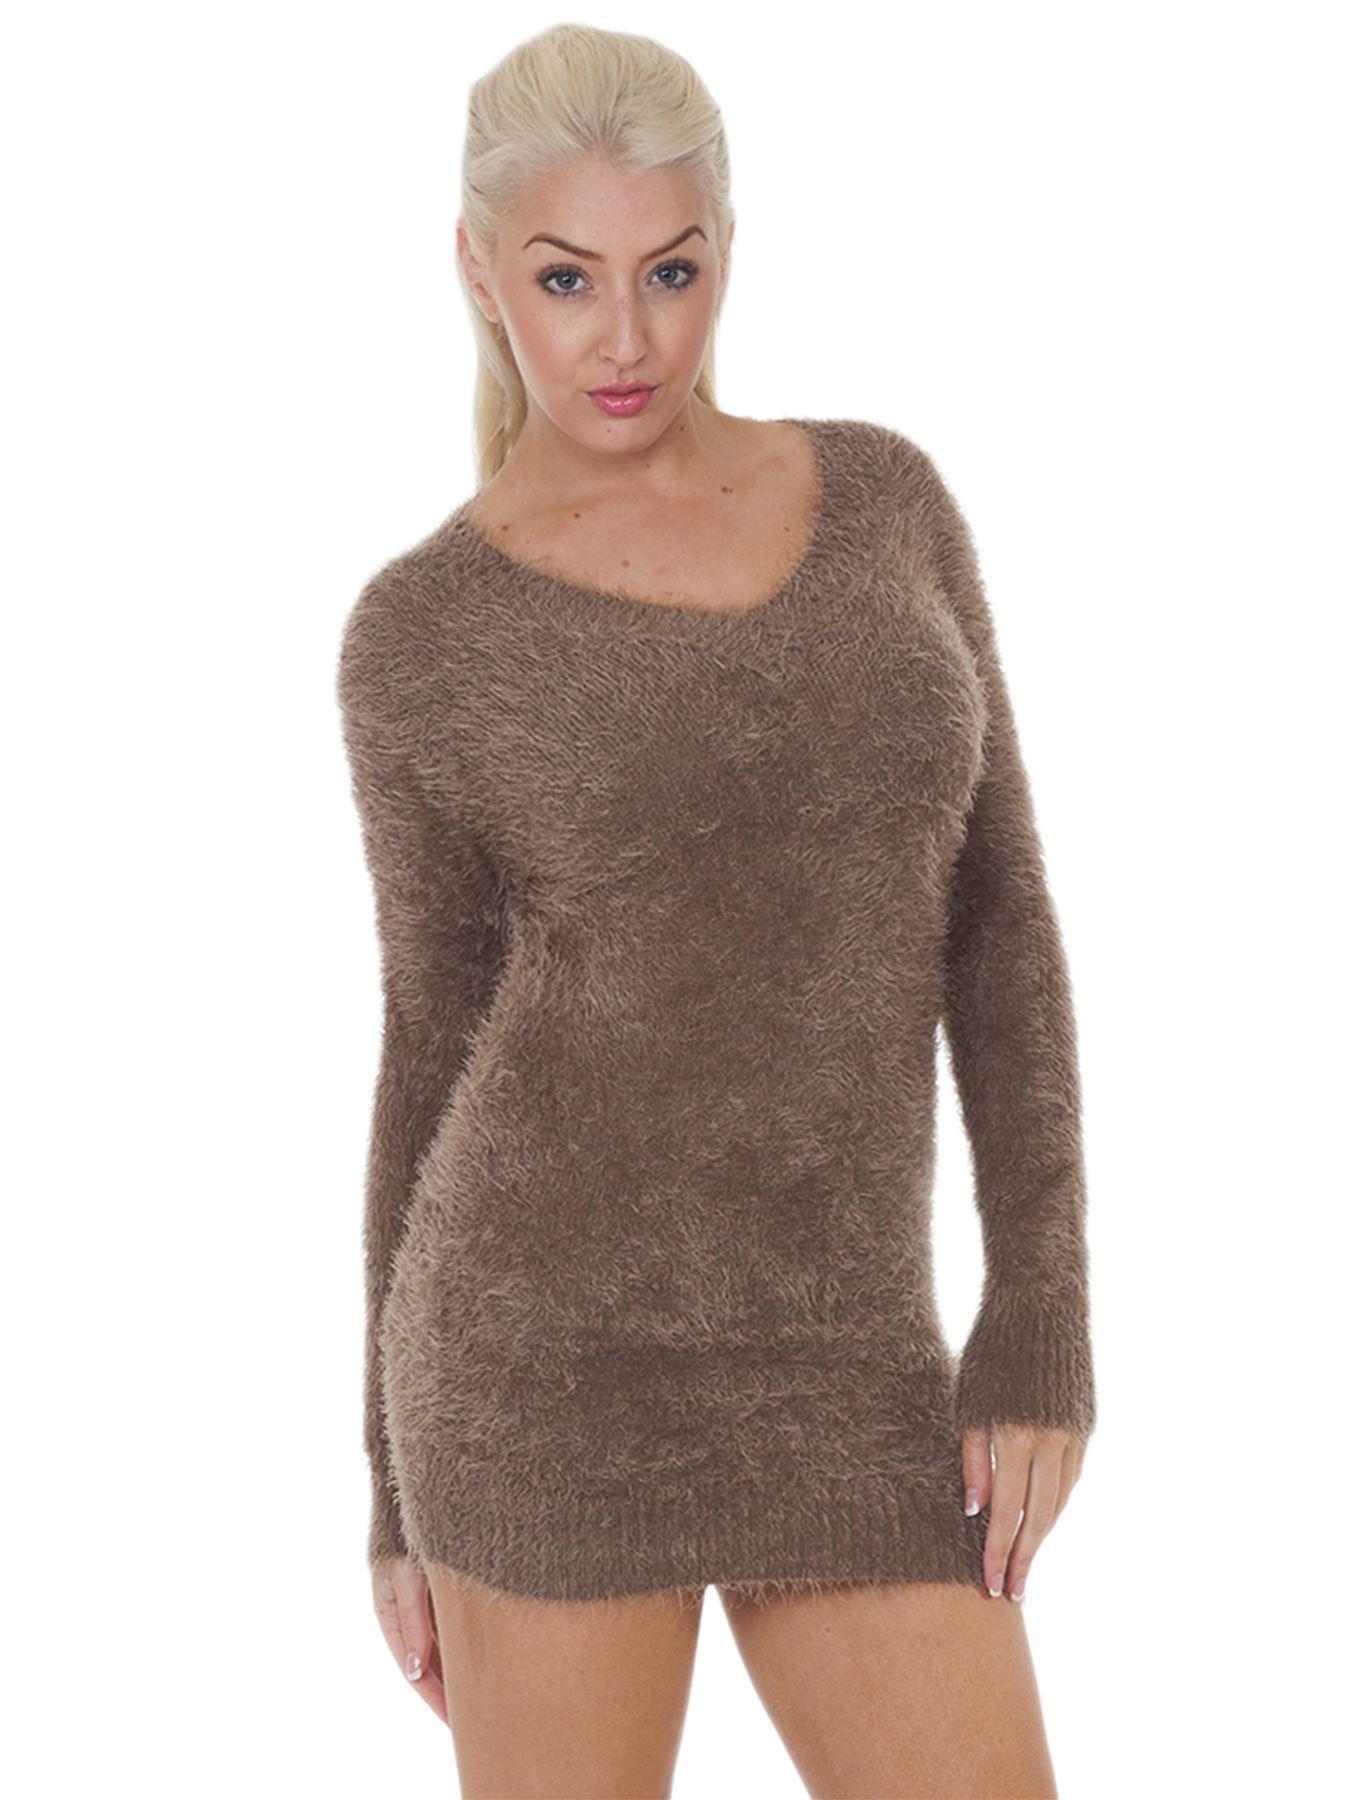 Pull-Femme-Femmes-Tricote-Cardigans-Plain-Tricot-Moelleux-Col-V-Manches-Longues miniature 20